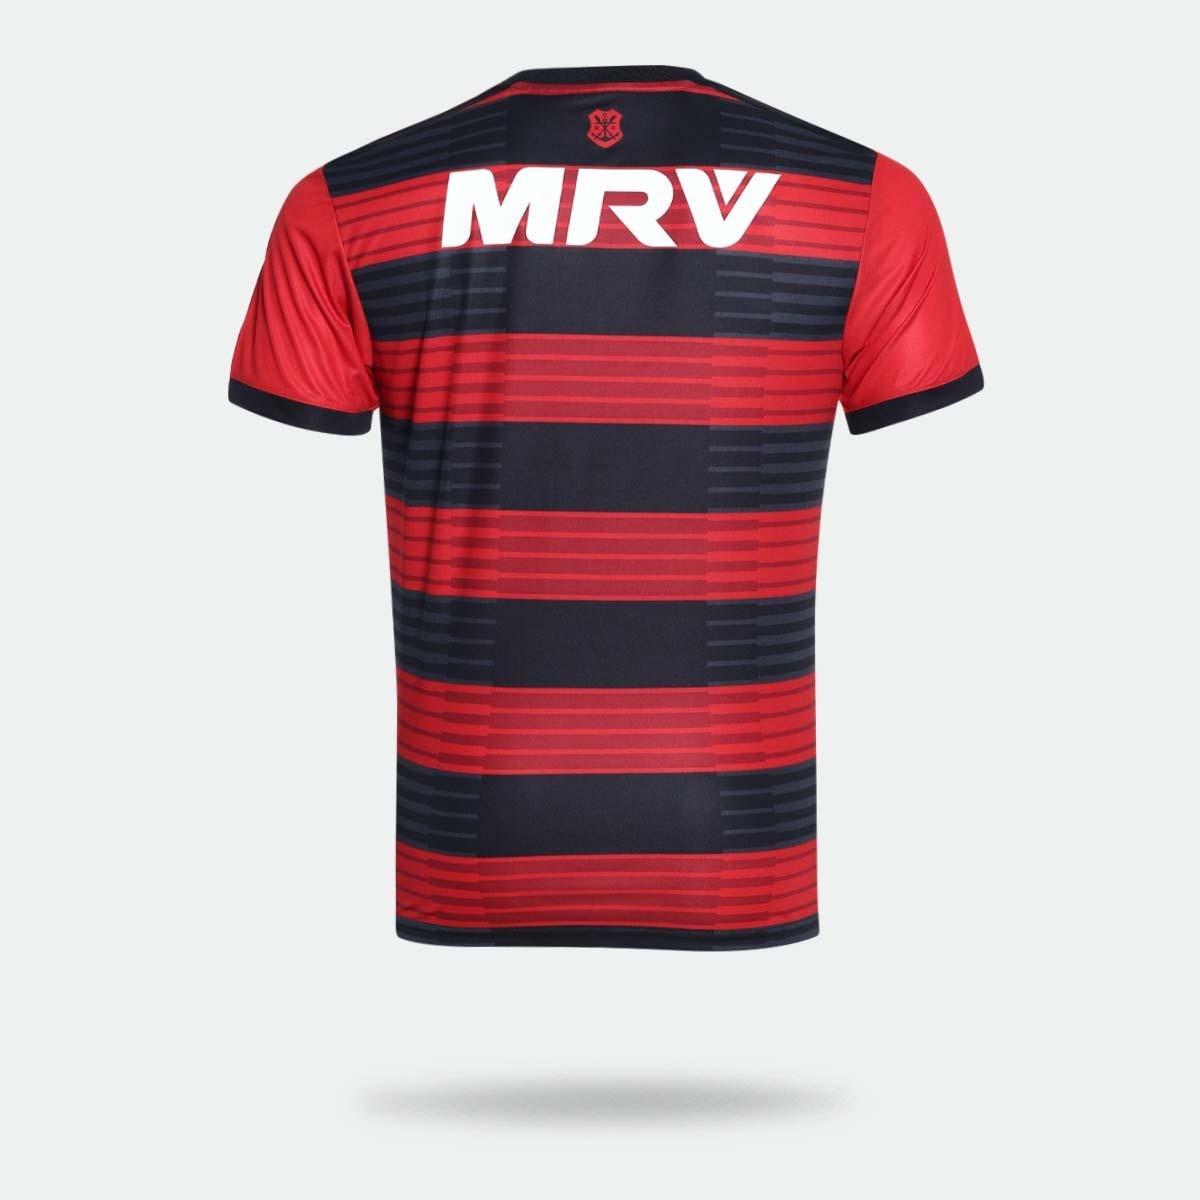 c0ba62c823 Camisa Flamengo I 2018 s n° Torcedor Adidas Masculina - Vermelho e ...